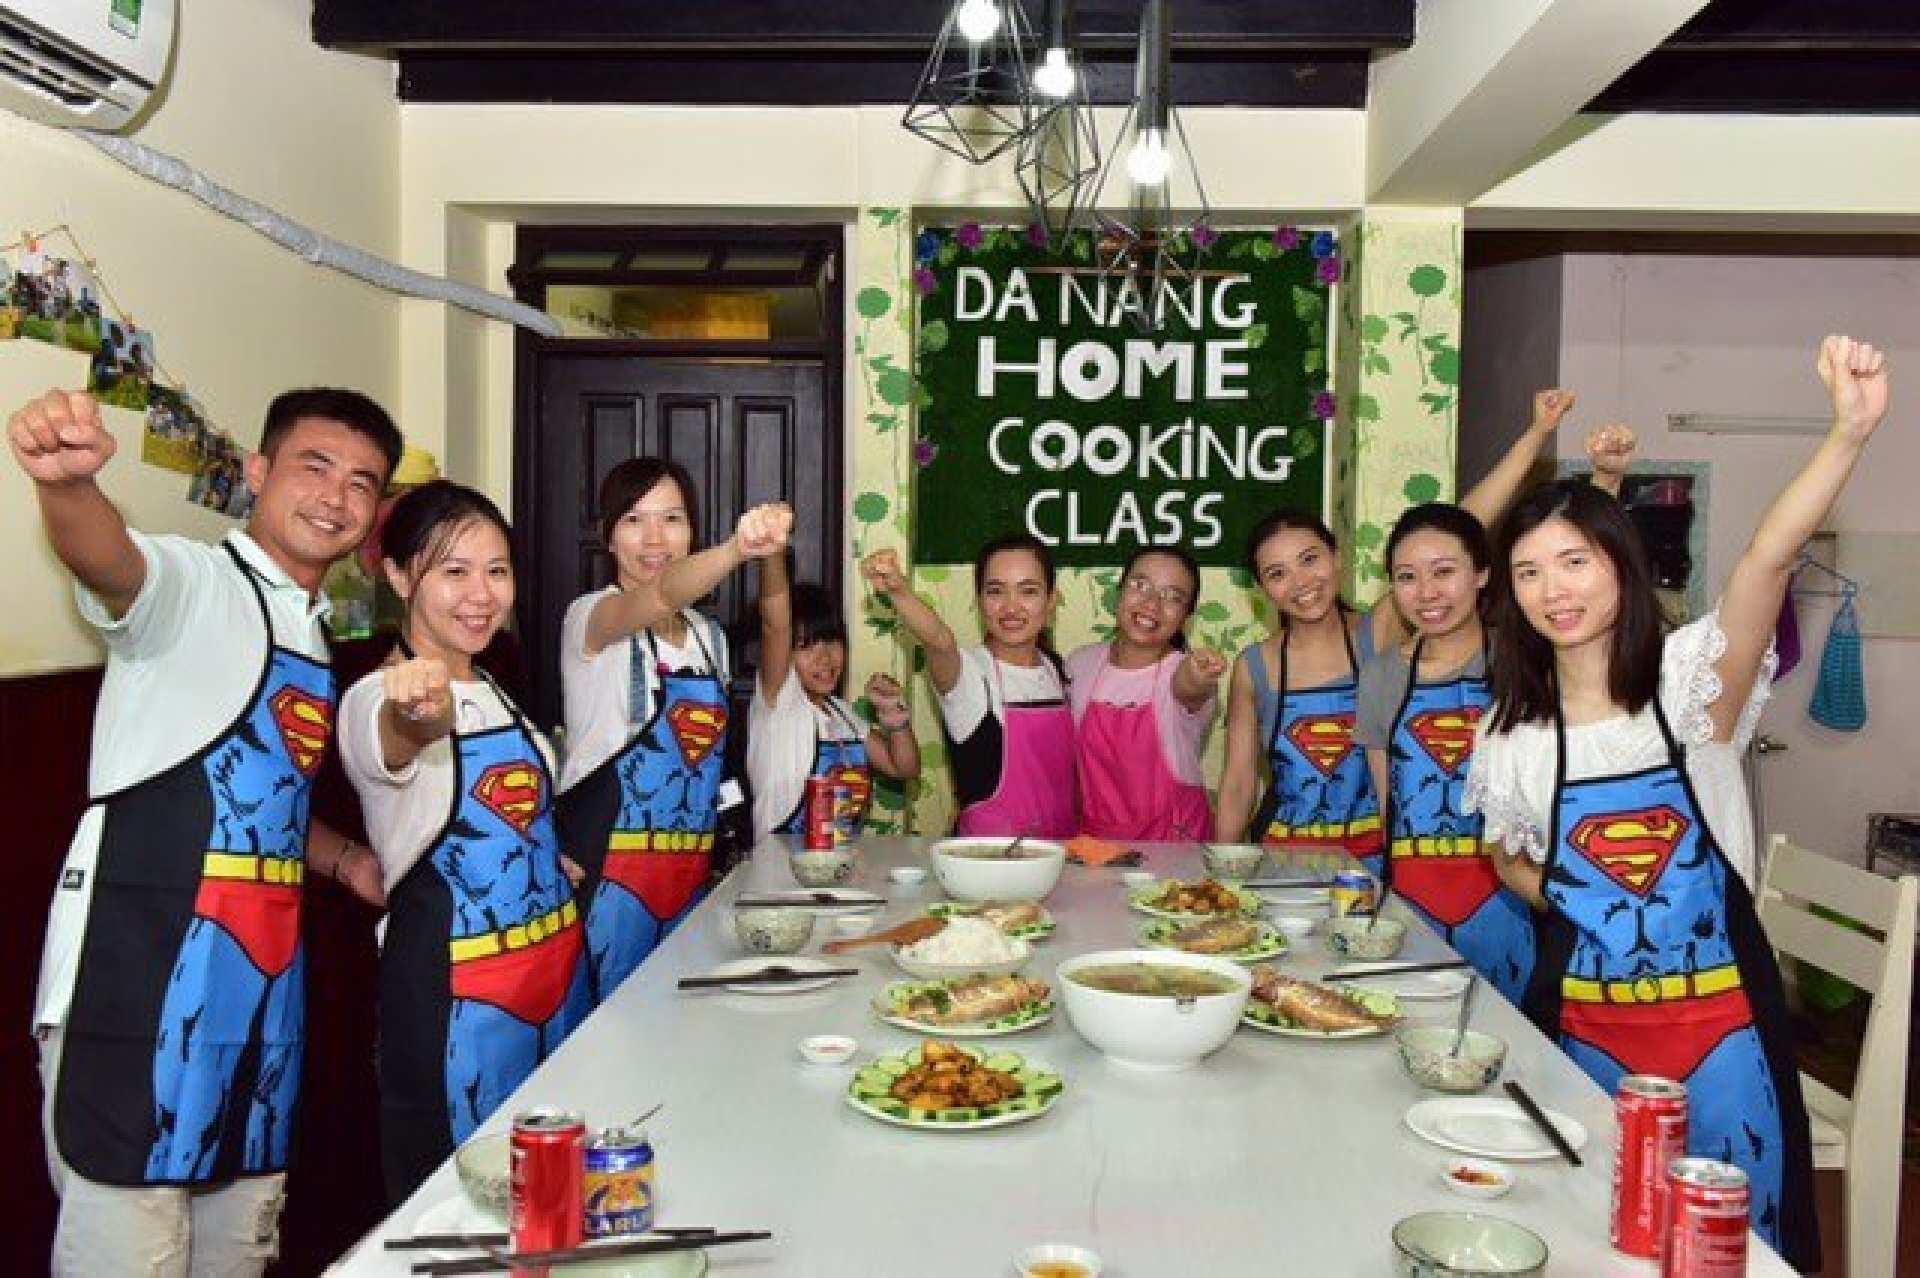 【Trip Advisor 上評價第一名】峴港廚藝教室 Danang Home Cooking Class